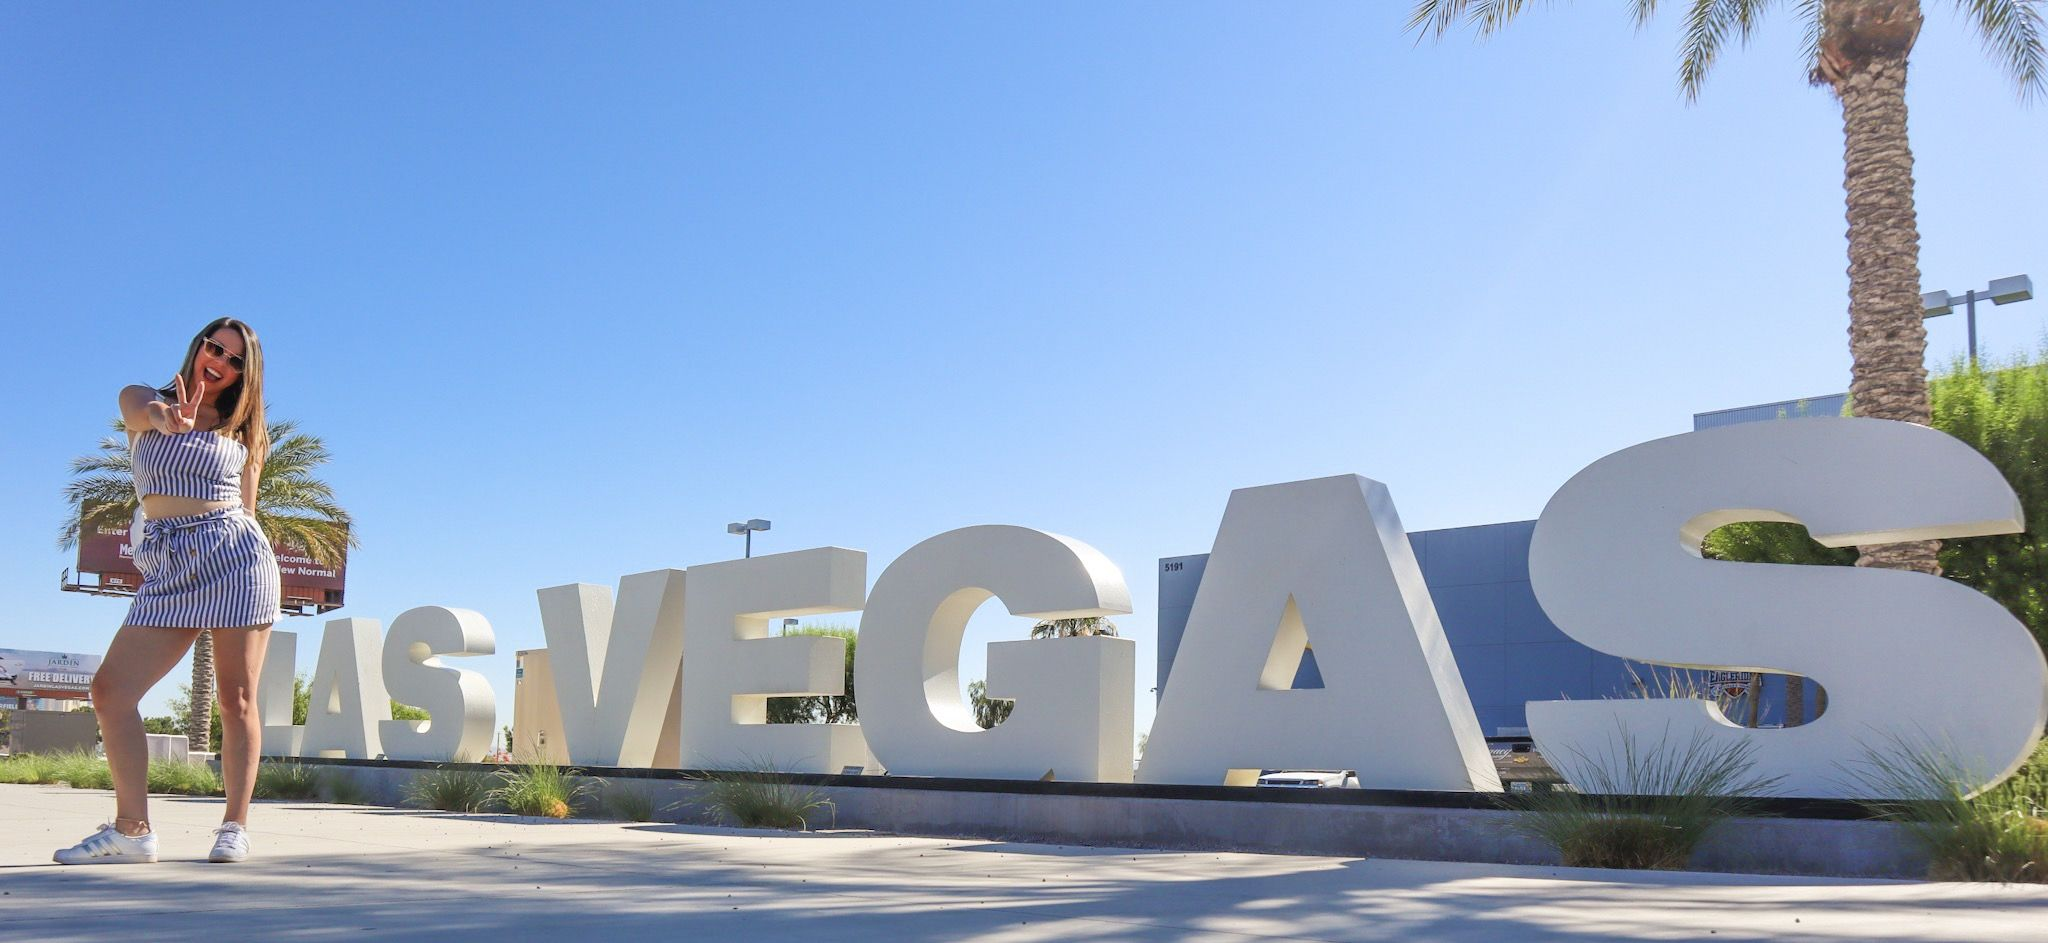 Viva Las Vegas, Viva Las Vegas…. (You must read that in